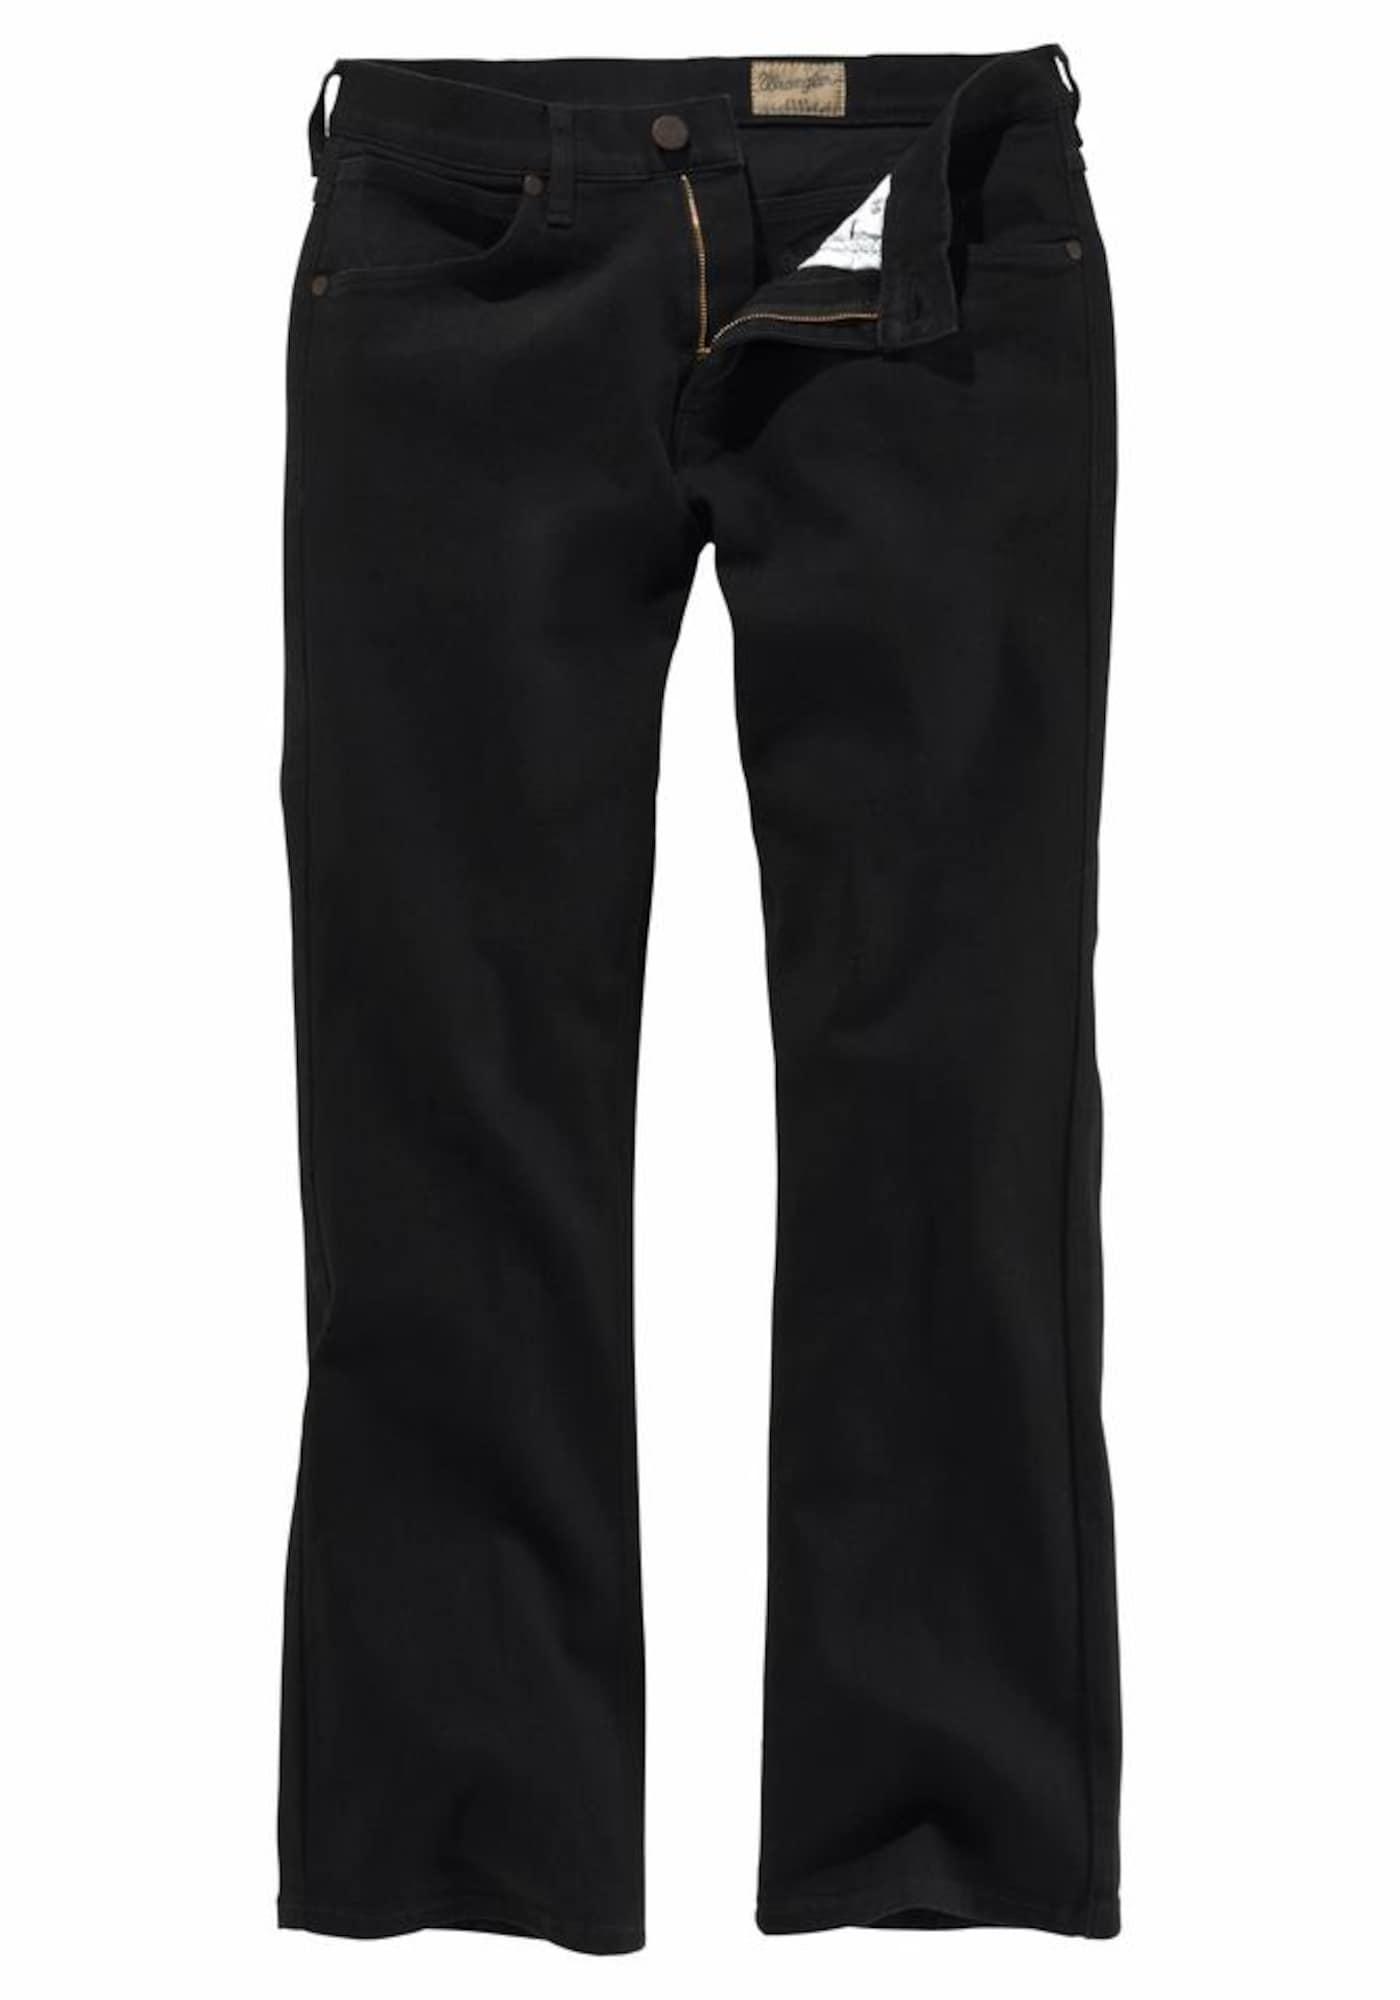 Bootcut-Jeans 'Jacksville'   Bekleidung > Jeans > Bootcut Jeans   Wrangler